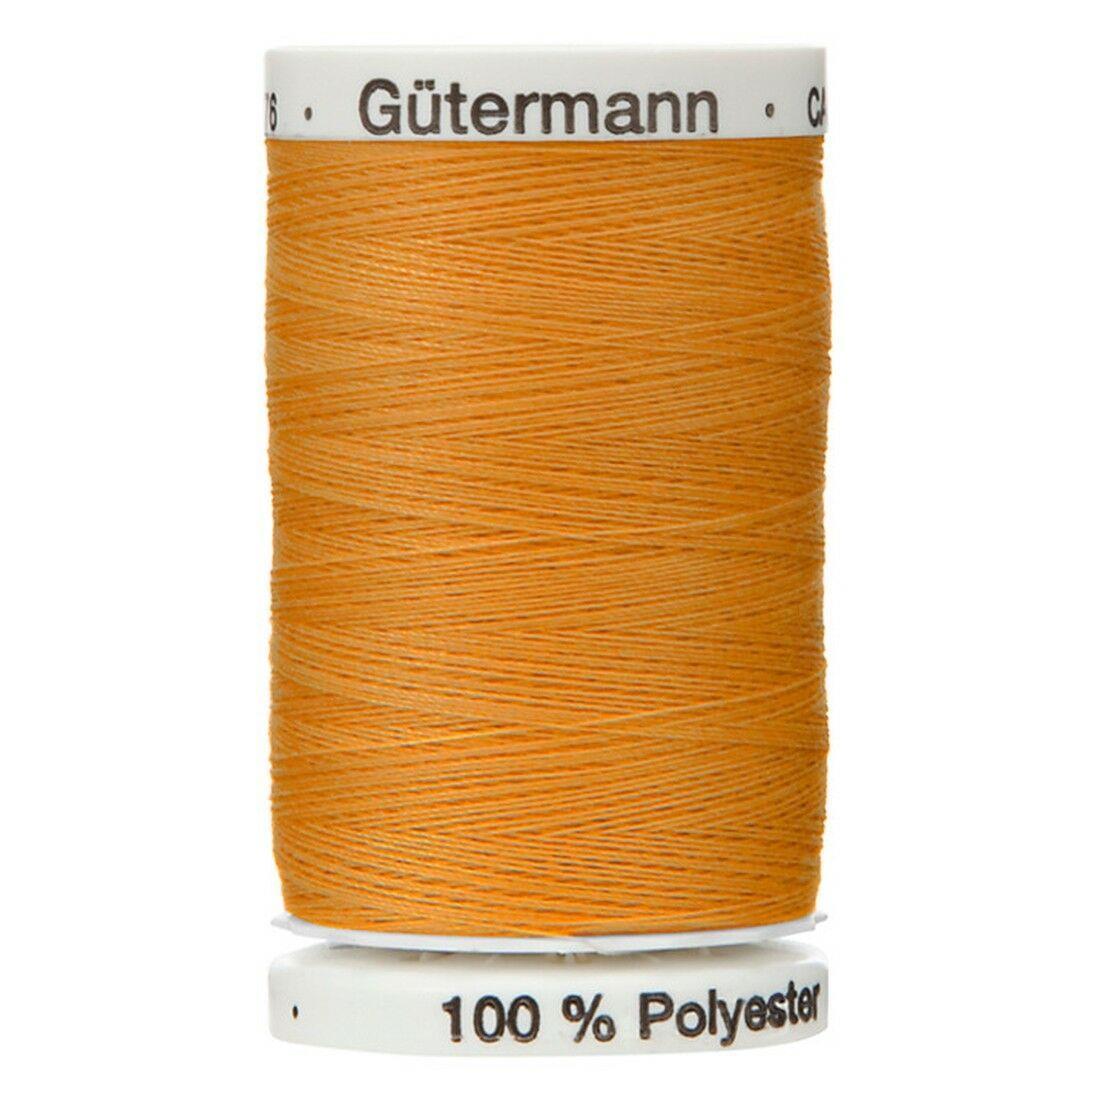 Guterman M1003 Extra Strong Thread 30 mt reels